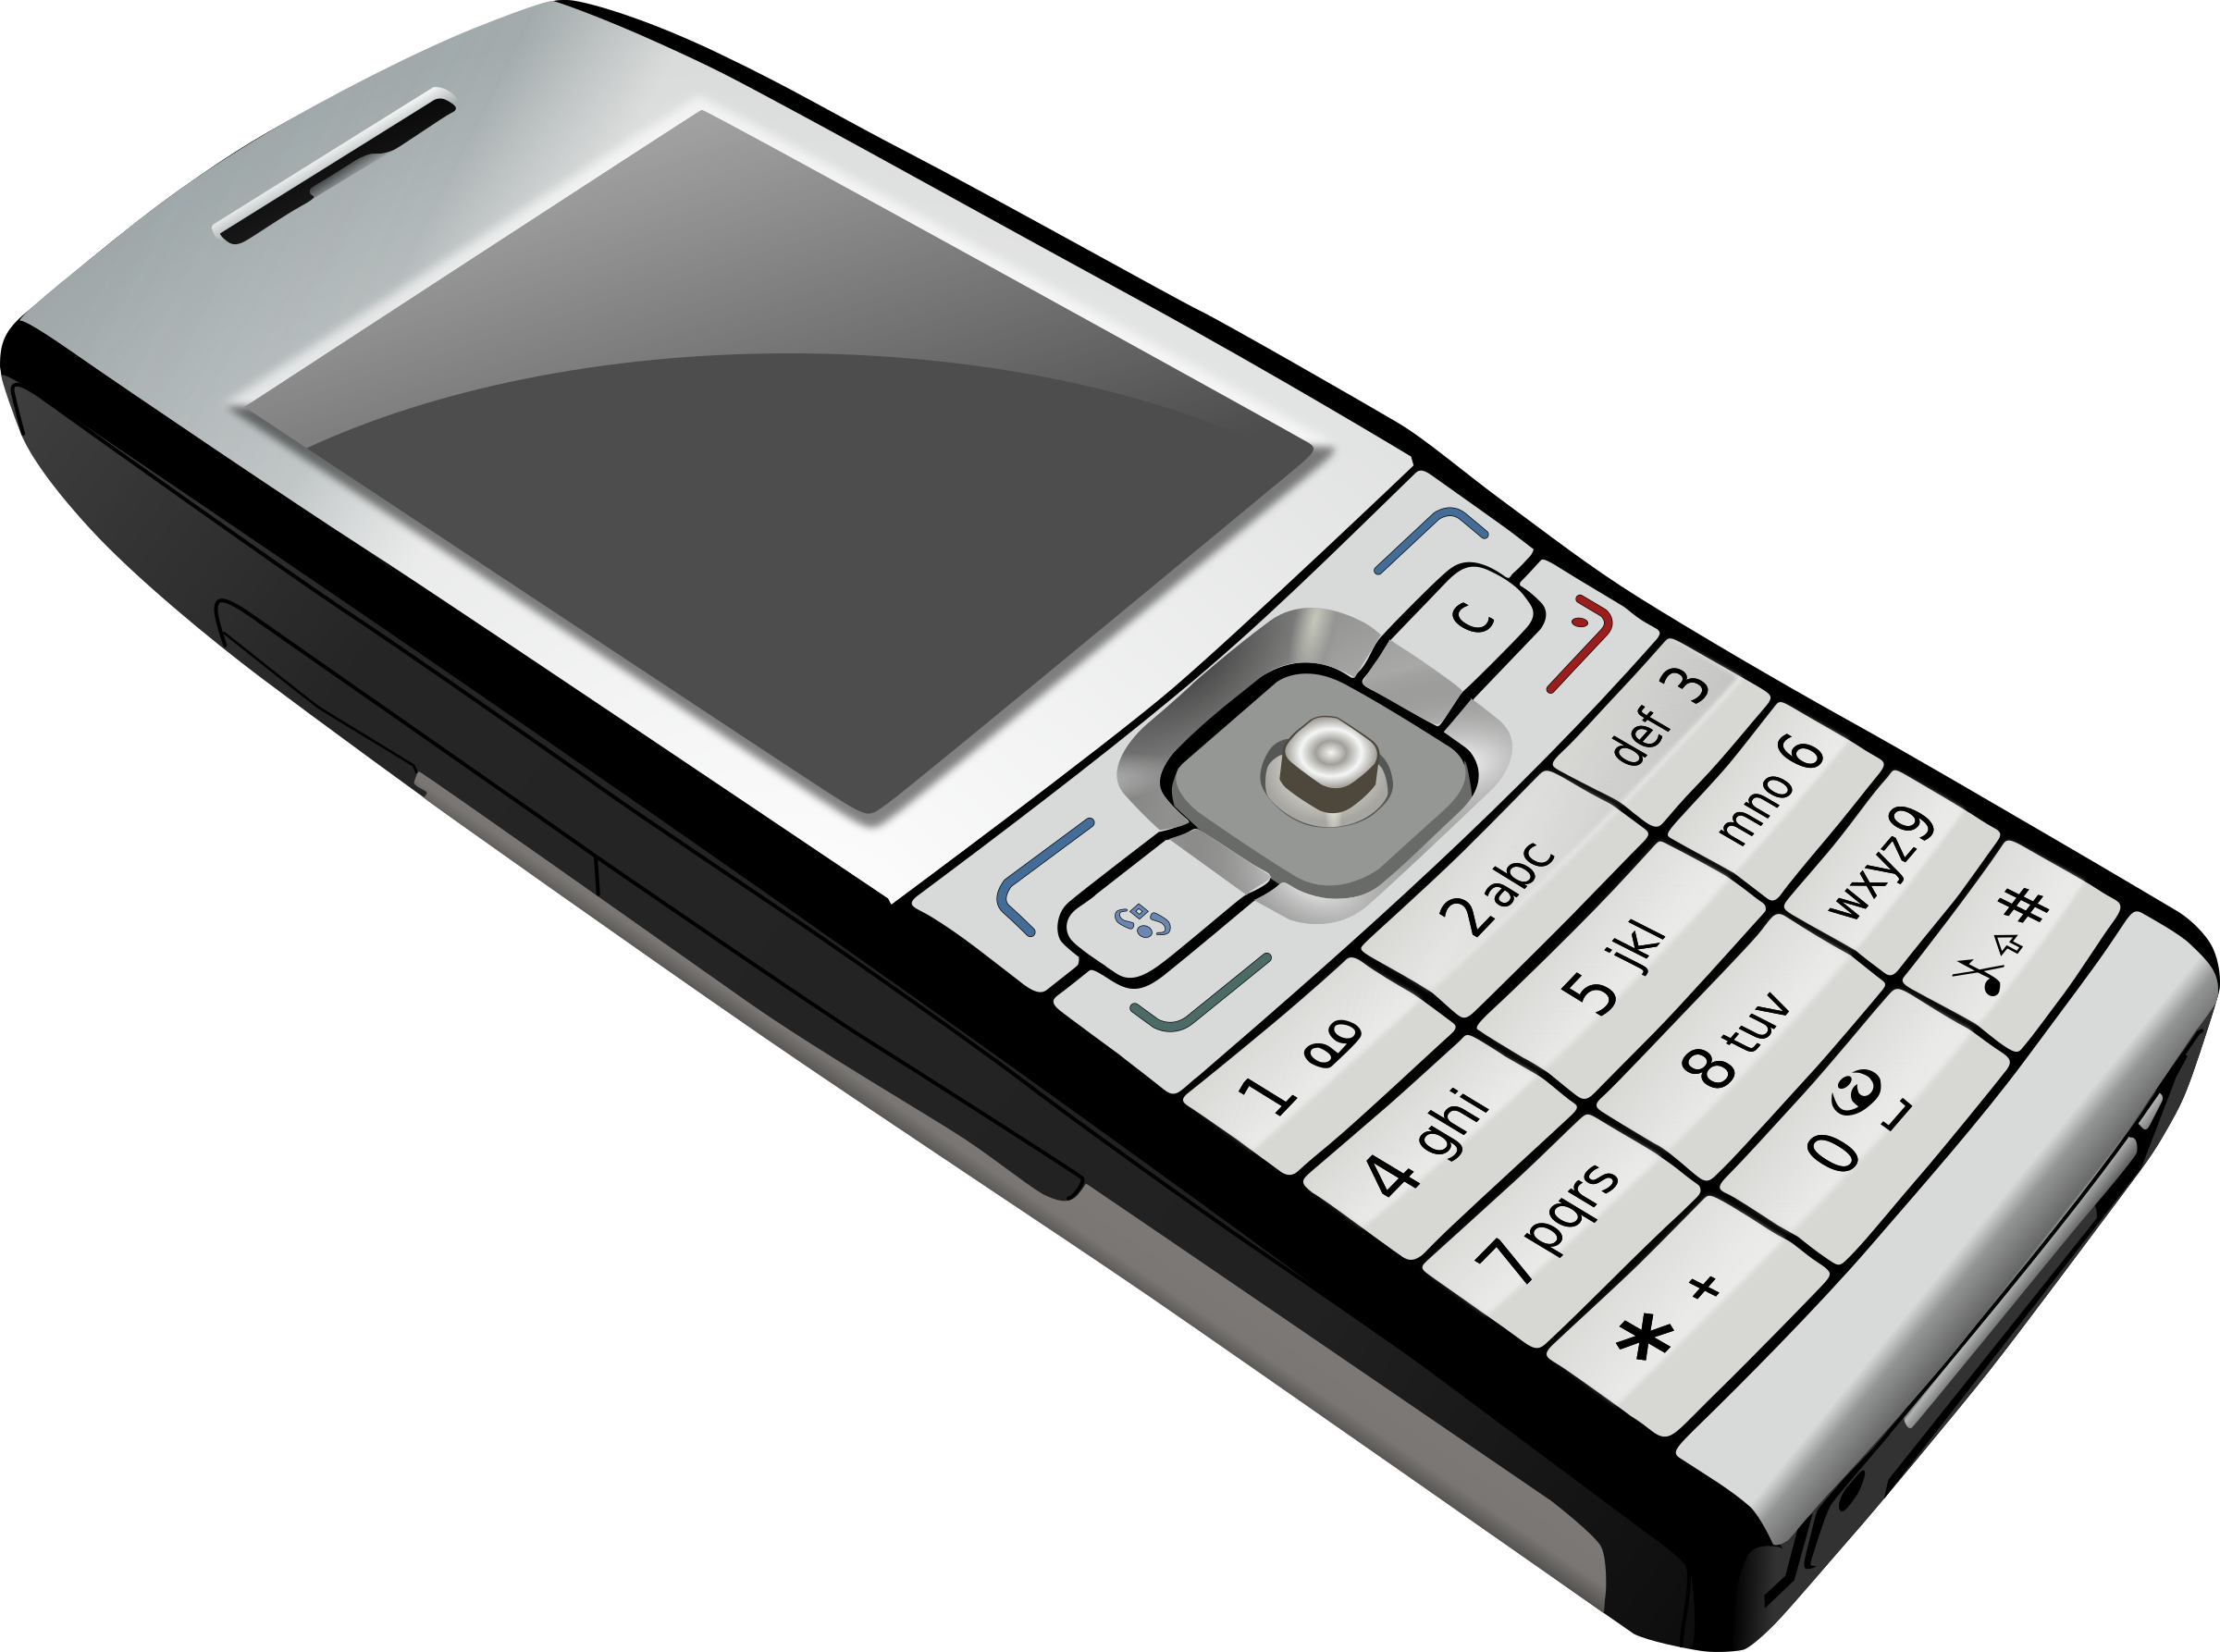 Clipart phone telphone. Big image png